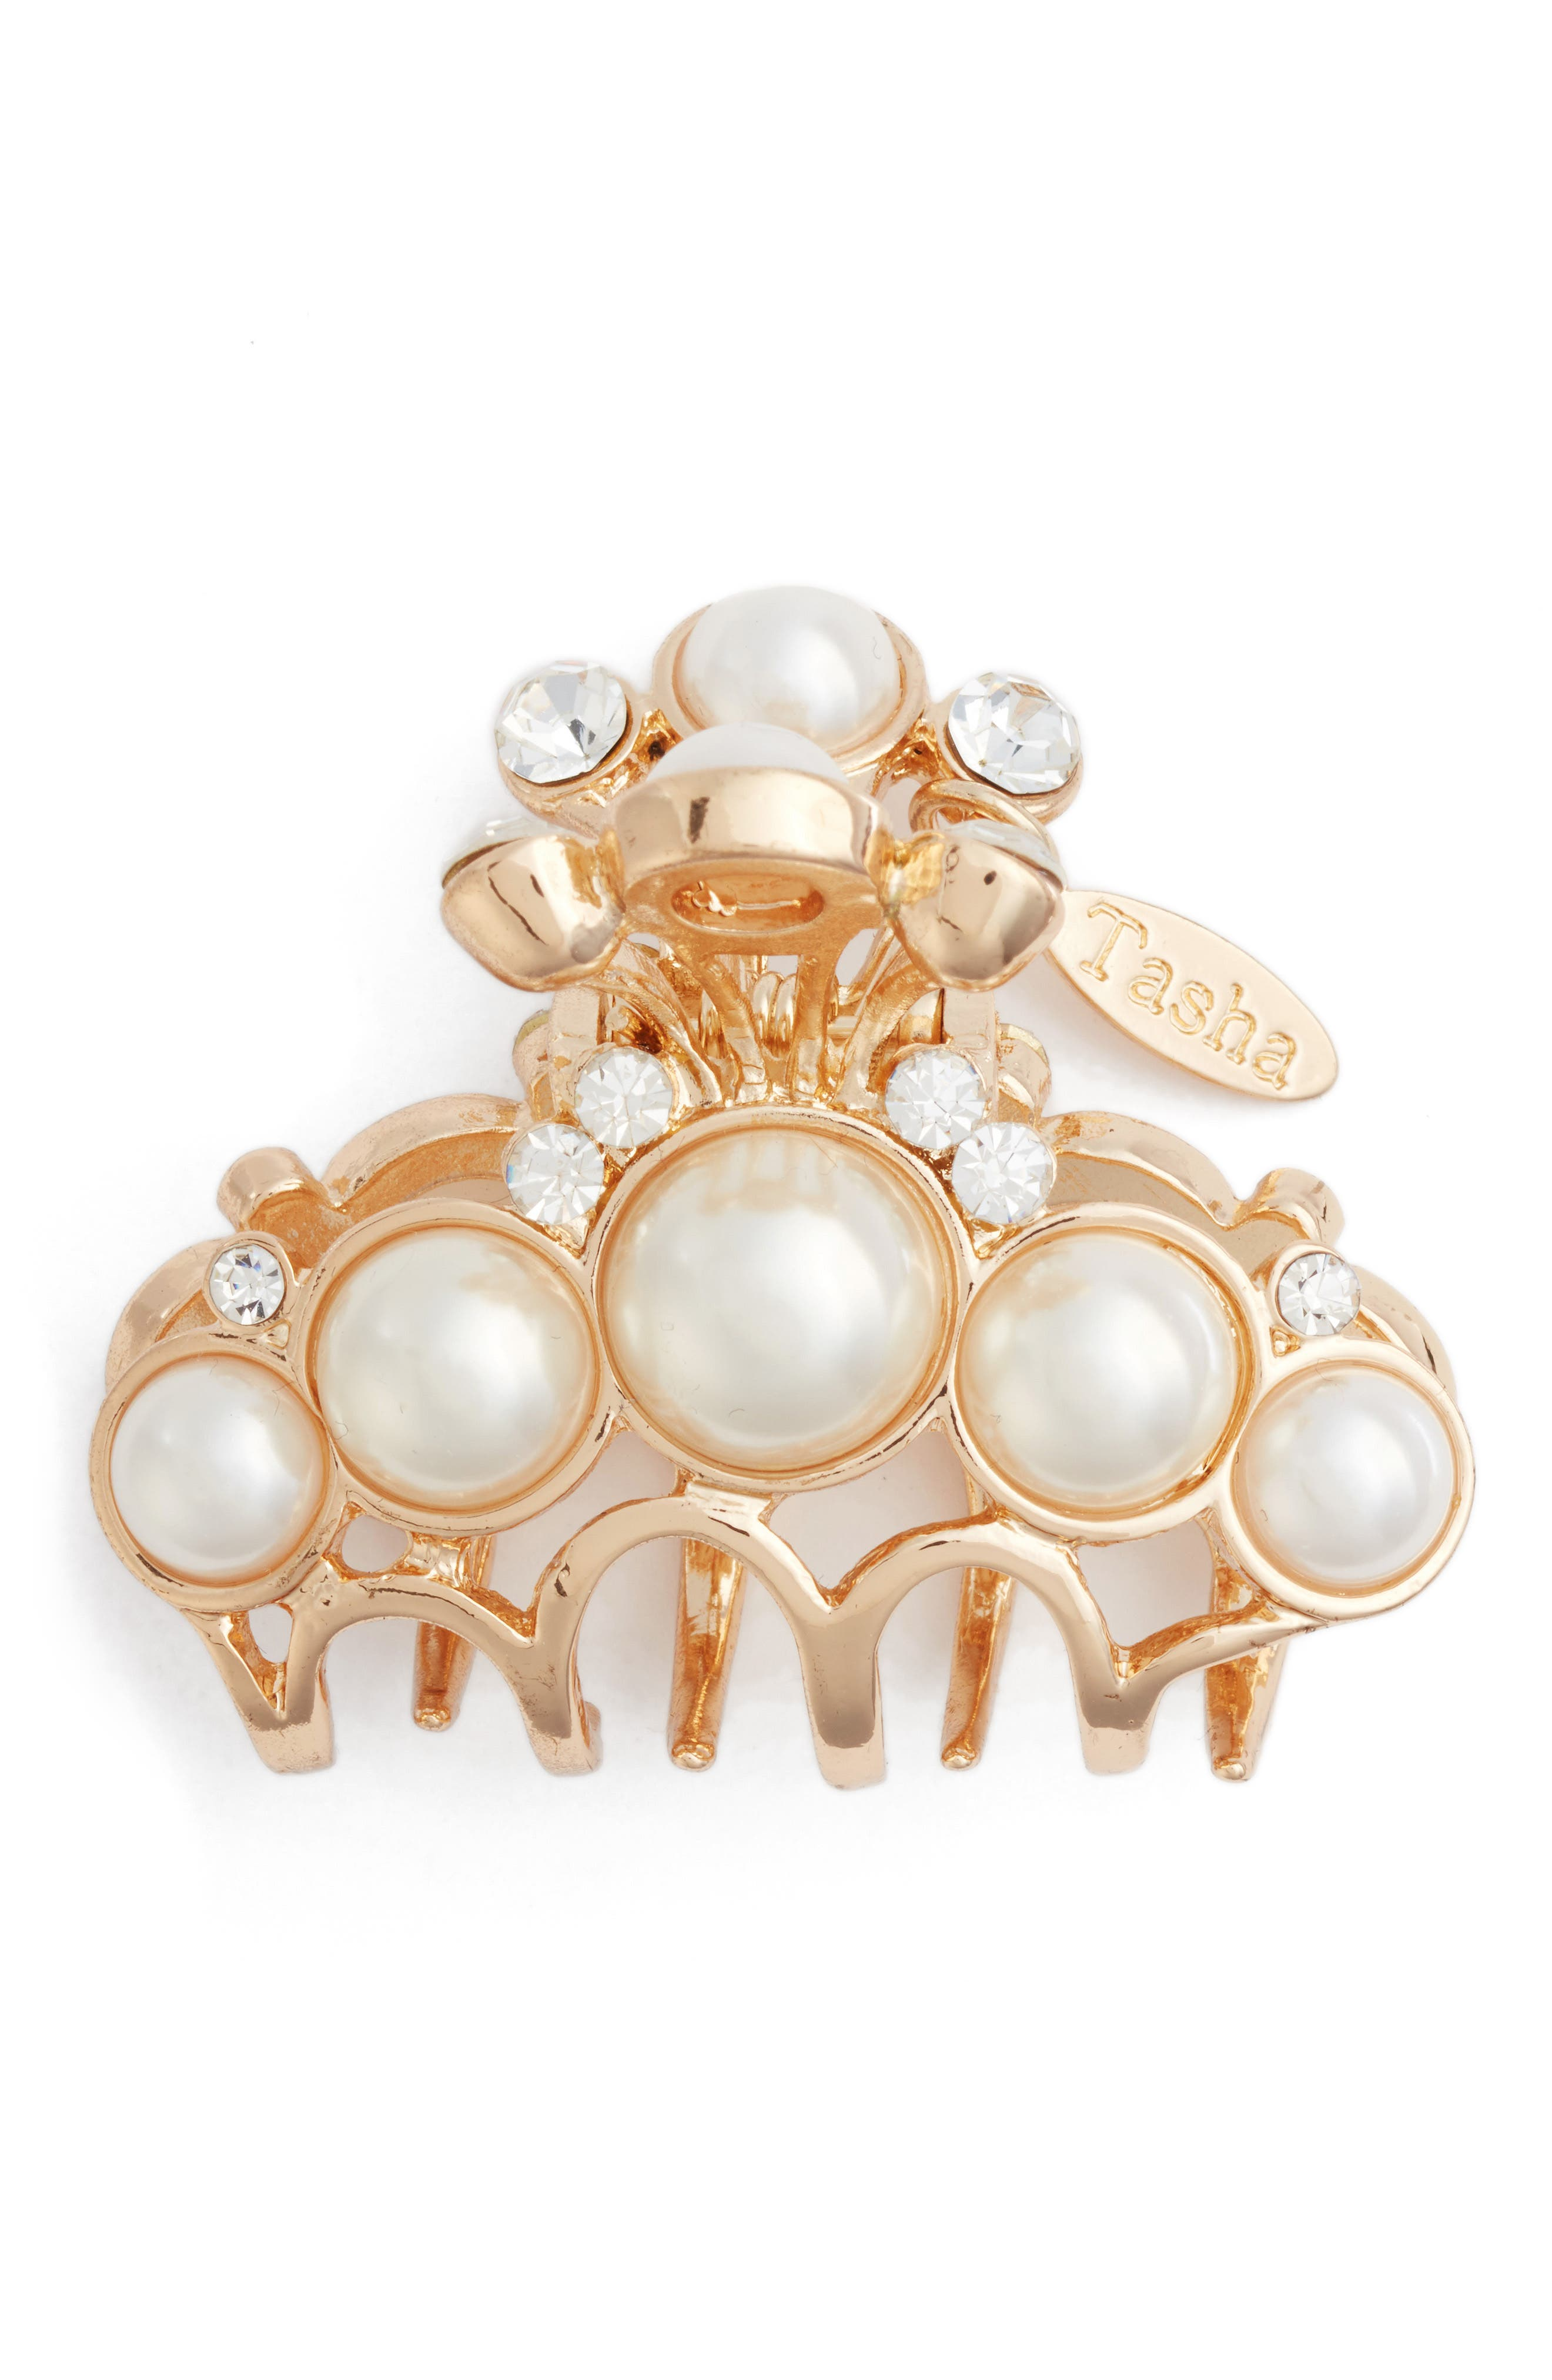 Main Image - Tasha Imitation Pearl & Crystal Embellished Jaw Clip